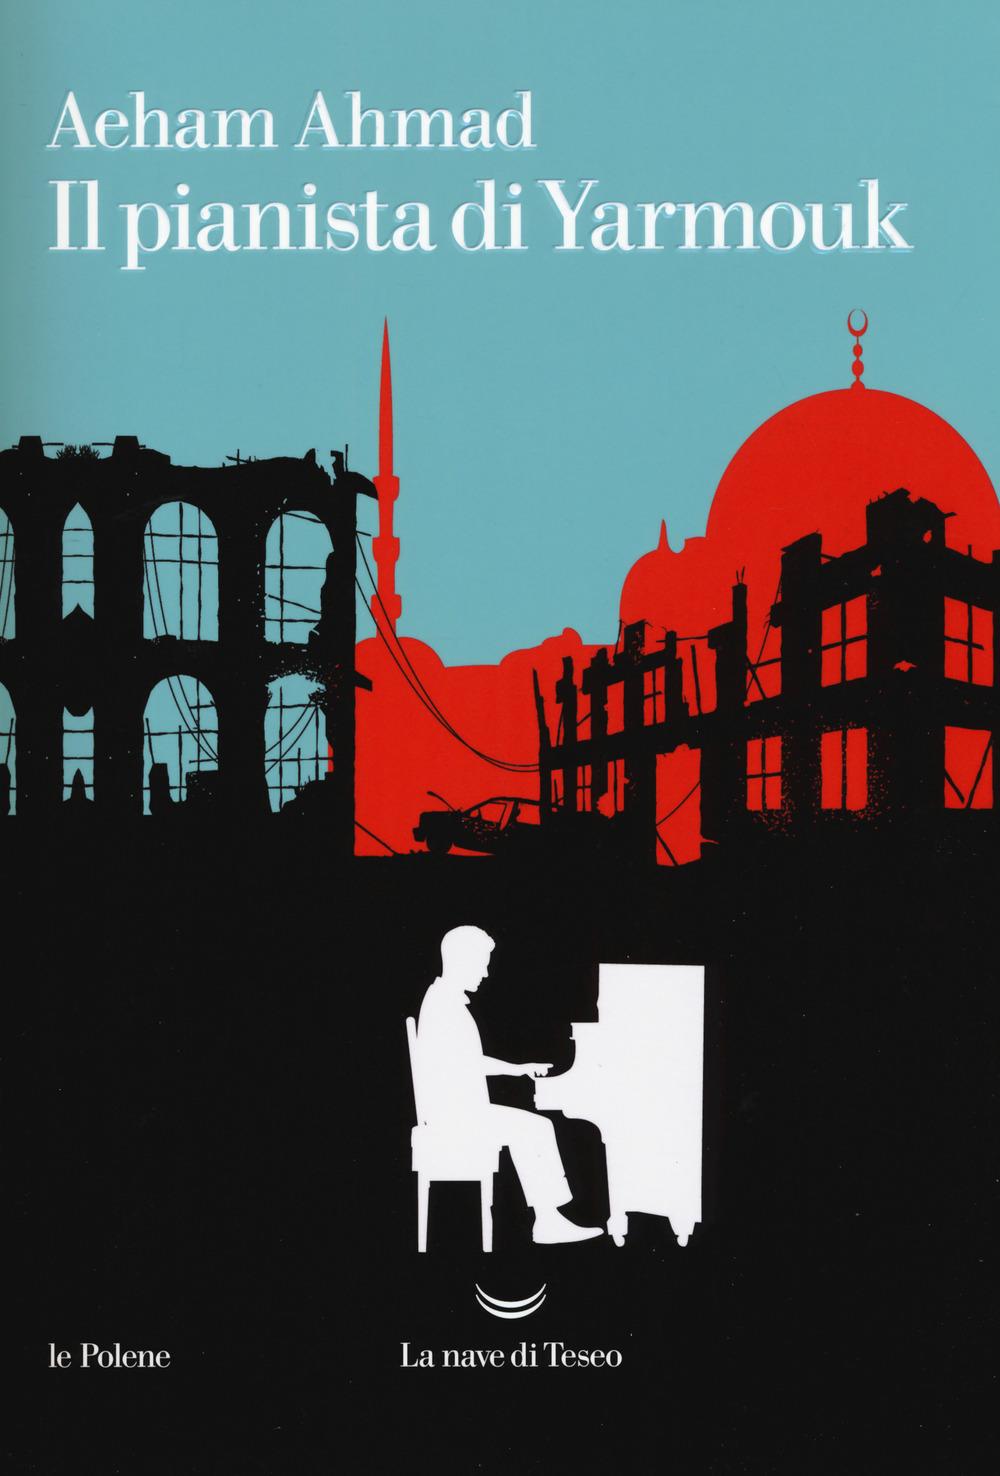 Aeham Ahmad - Il pianista di Yarmouk 4 - fanzine